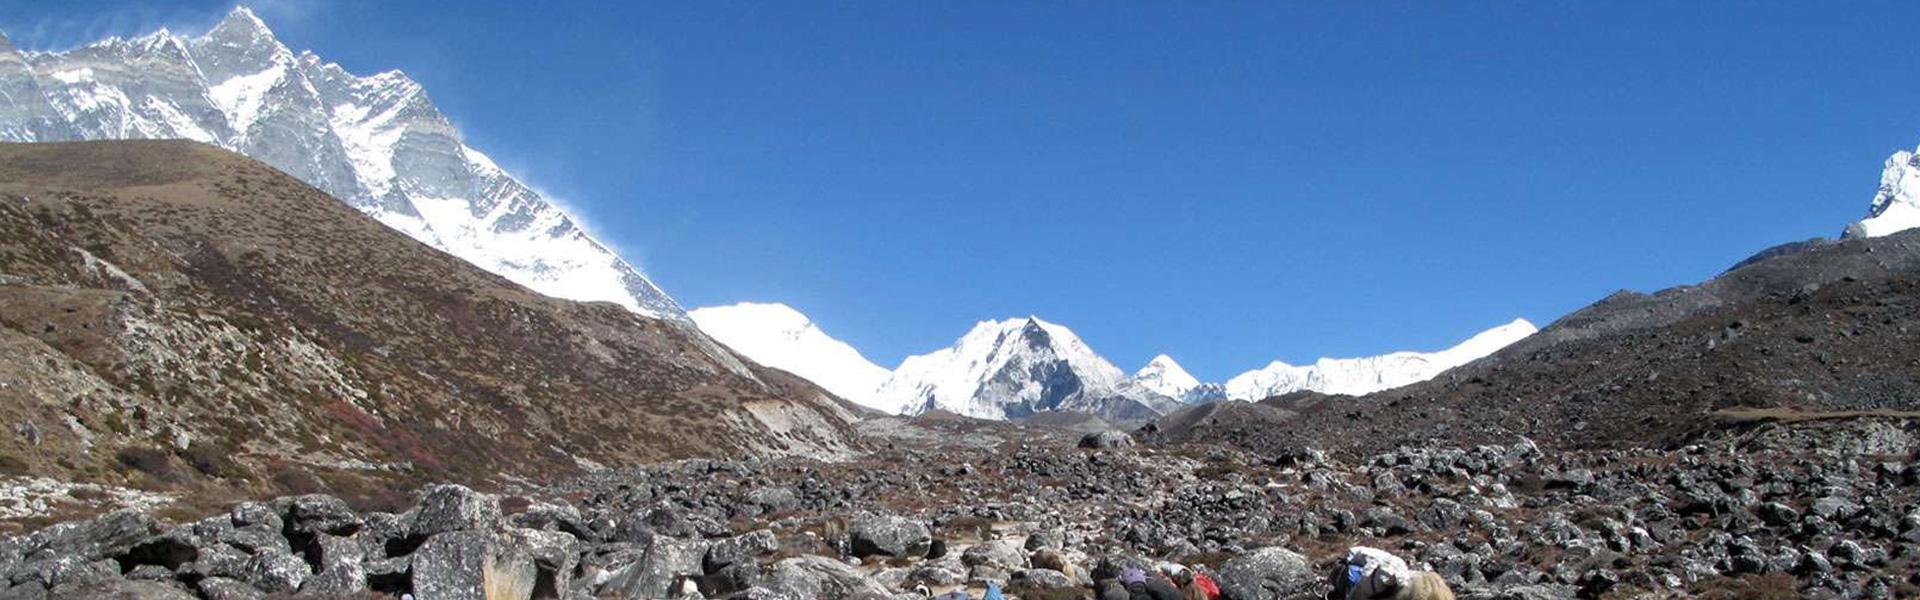 Everest Base Camp trek in winter